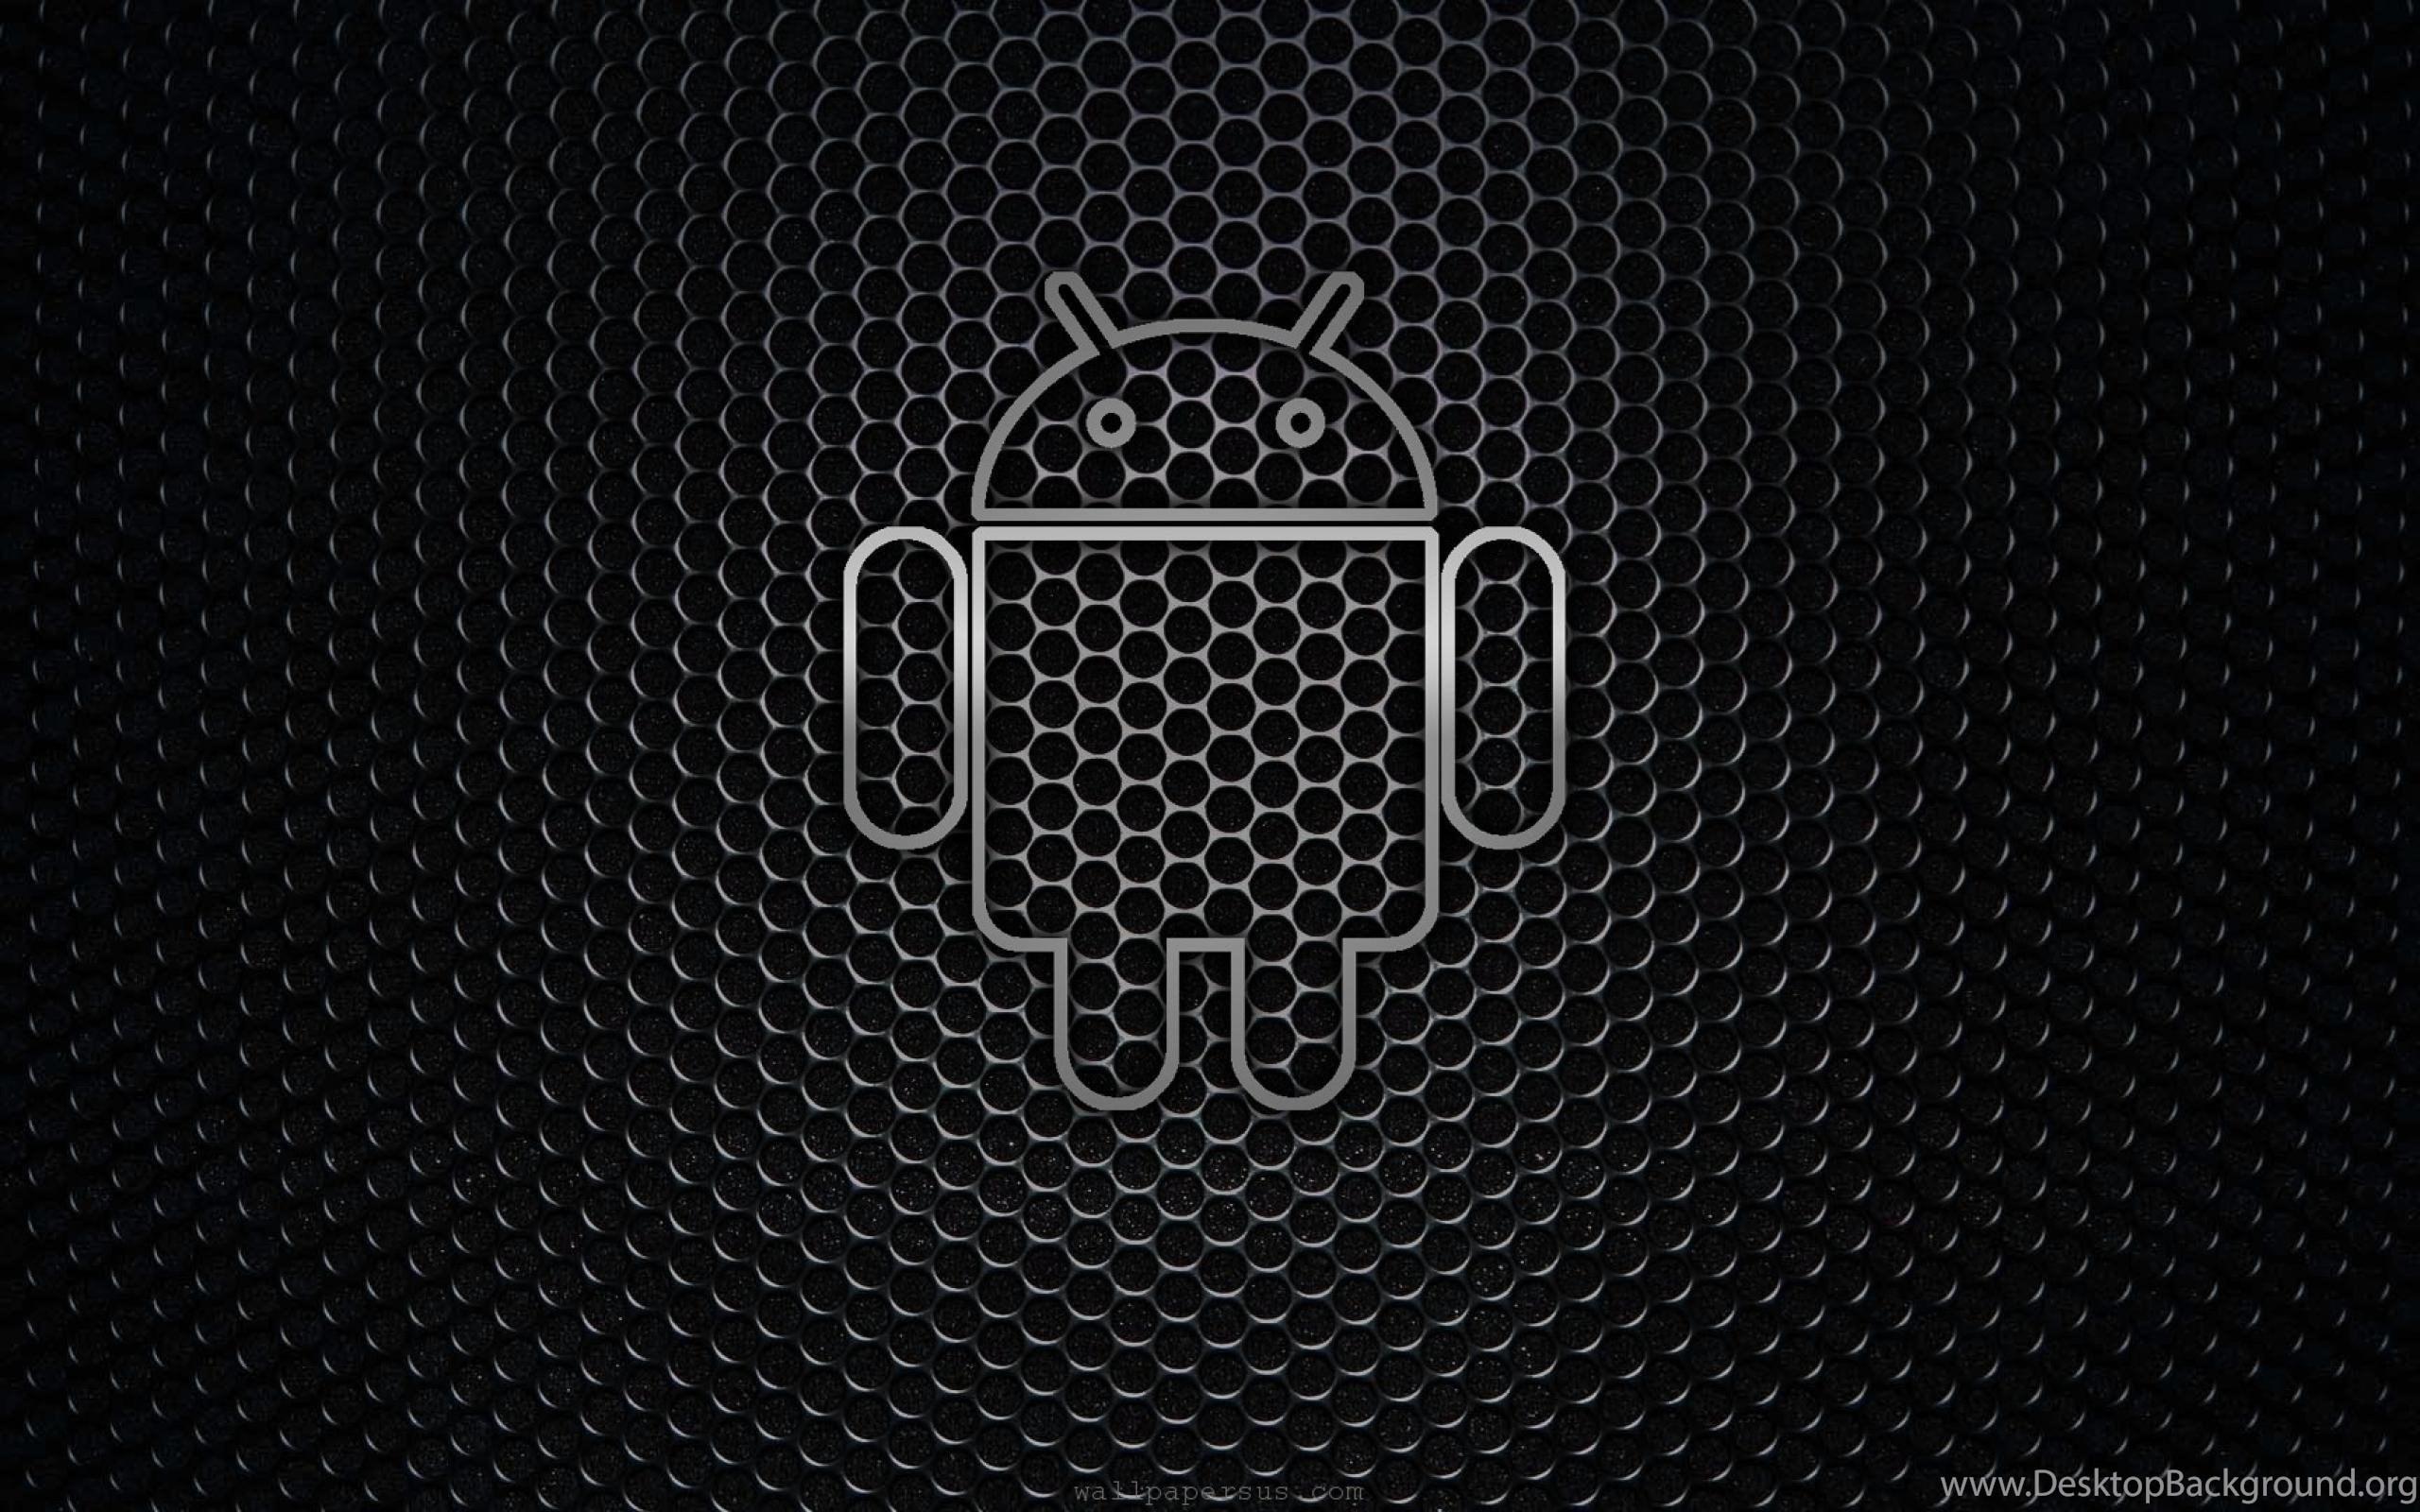 Desktop Android Black Logo Backgrounds Wallpapers